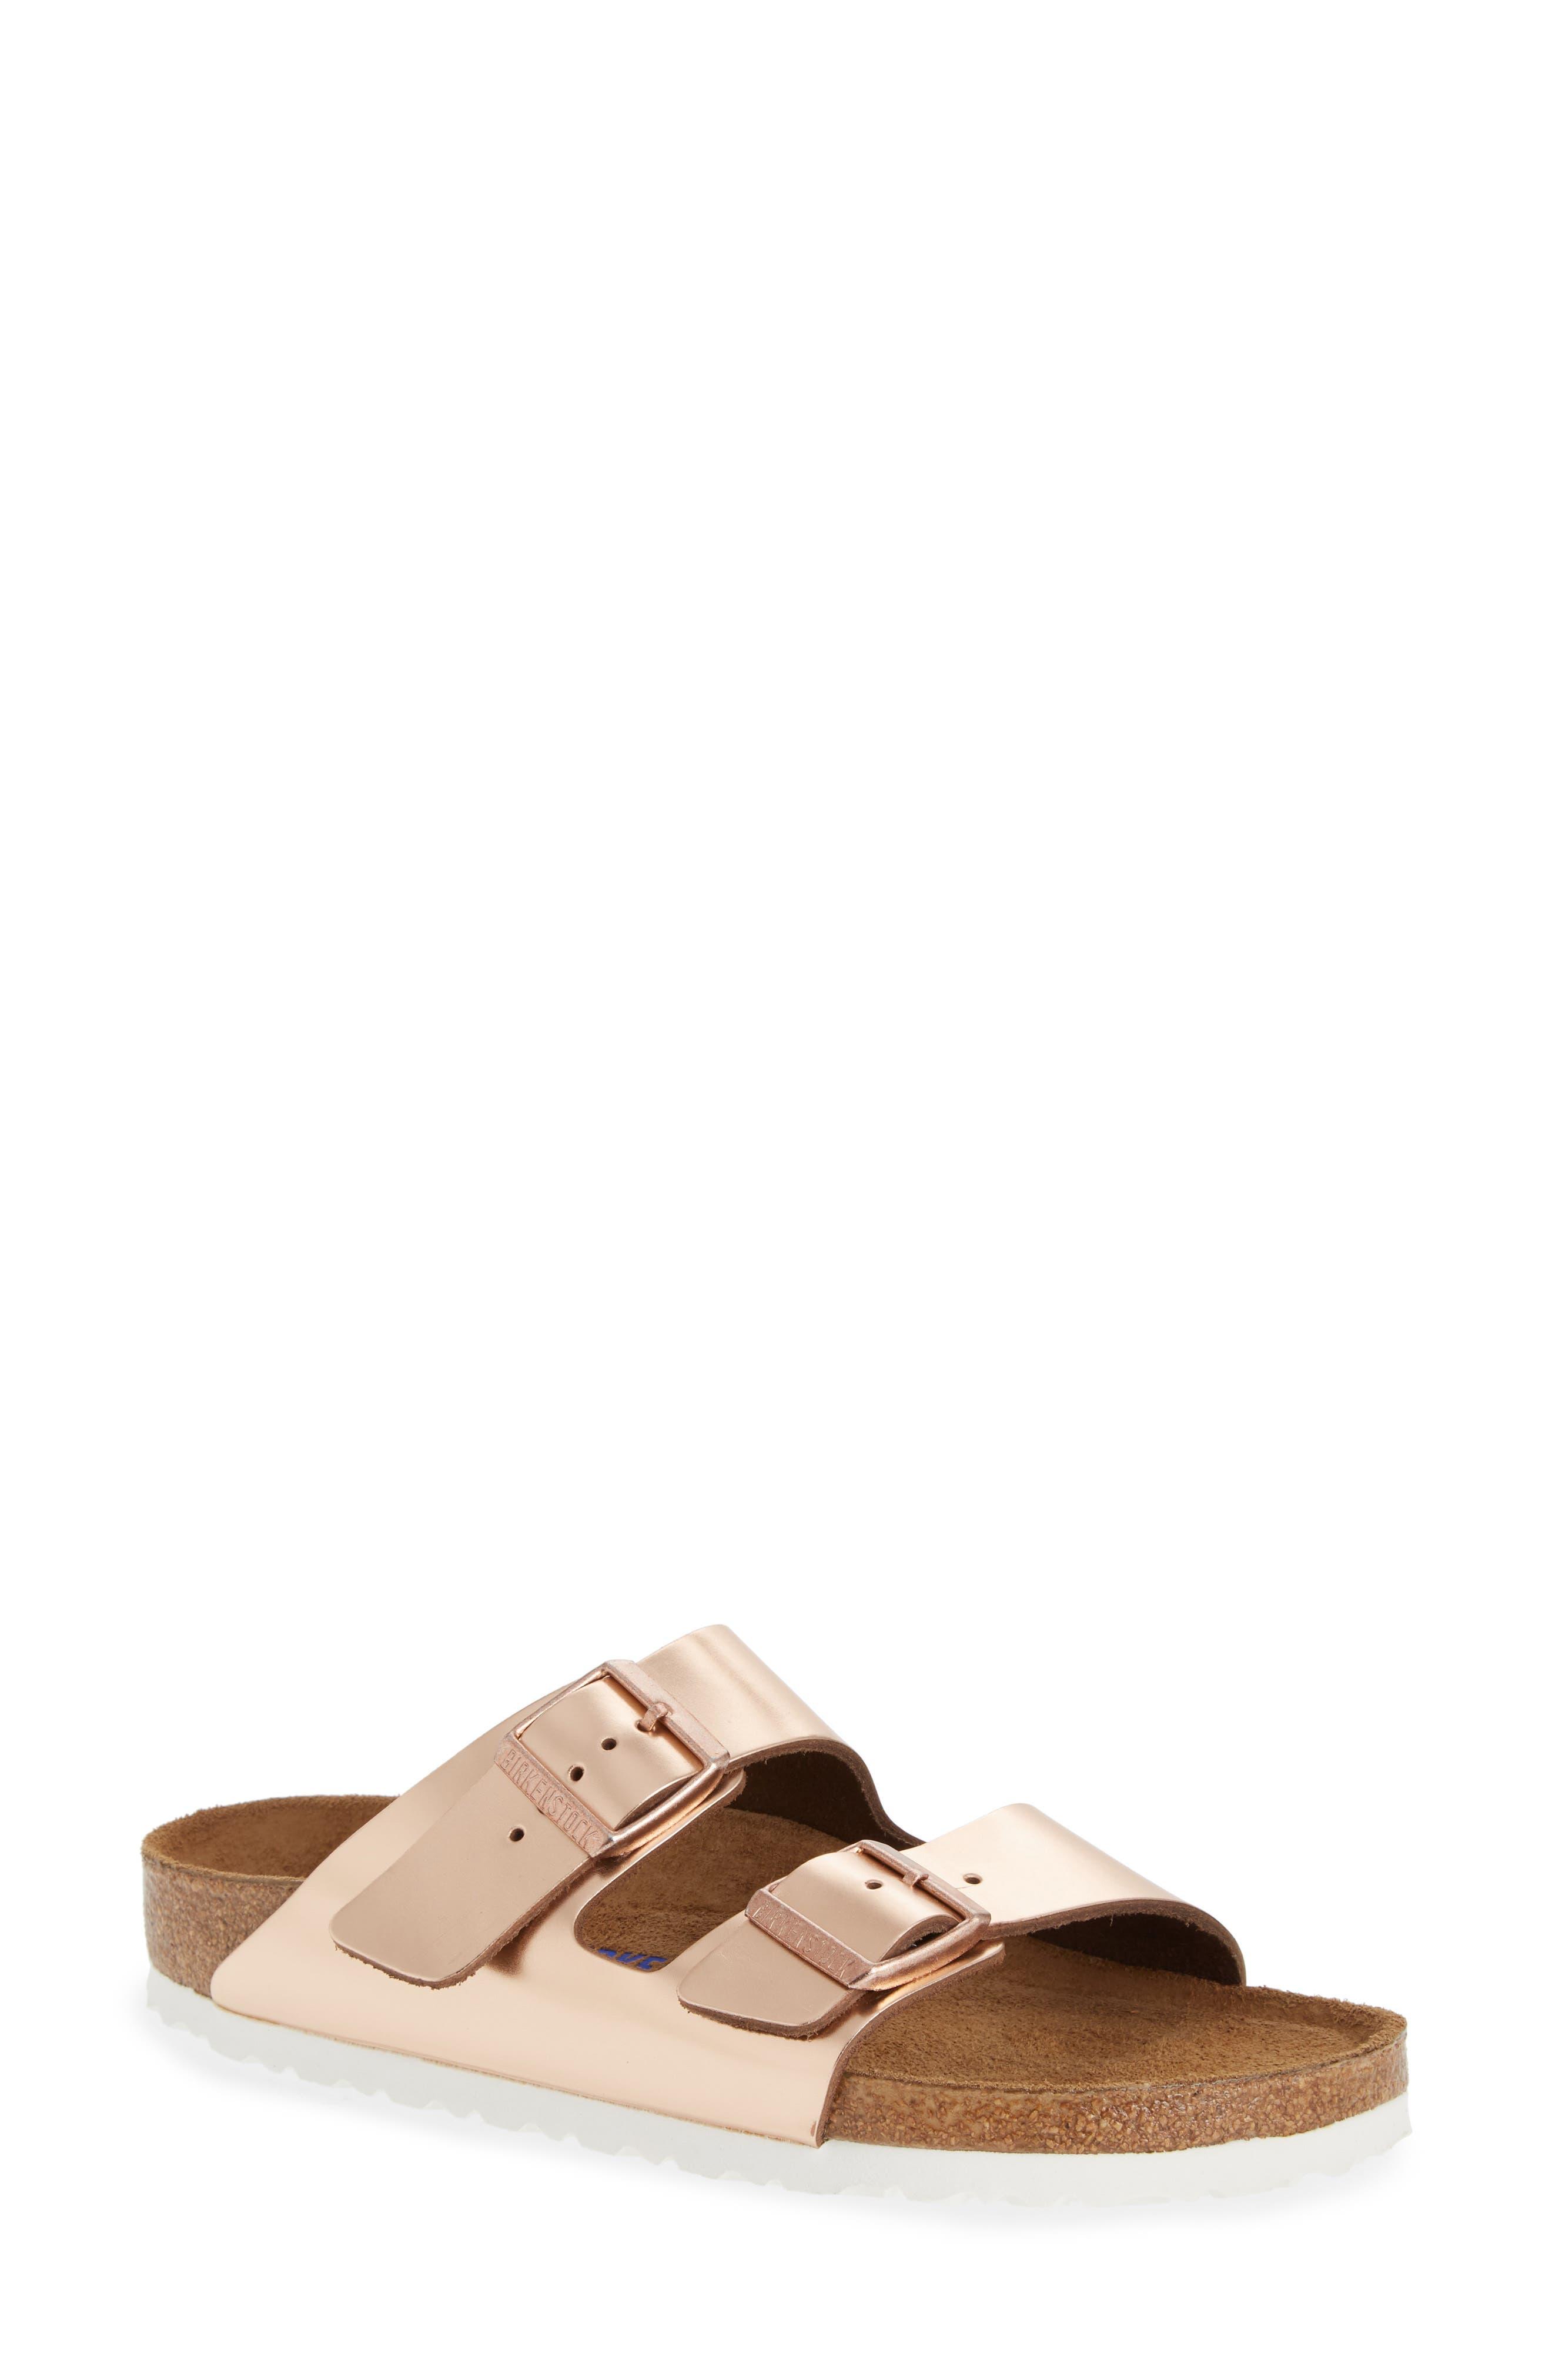 BIRKENSTOCK, 'Arizona' Soft Footbed Sandal, Main thumbnail 1, color, COPPER LEATHER